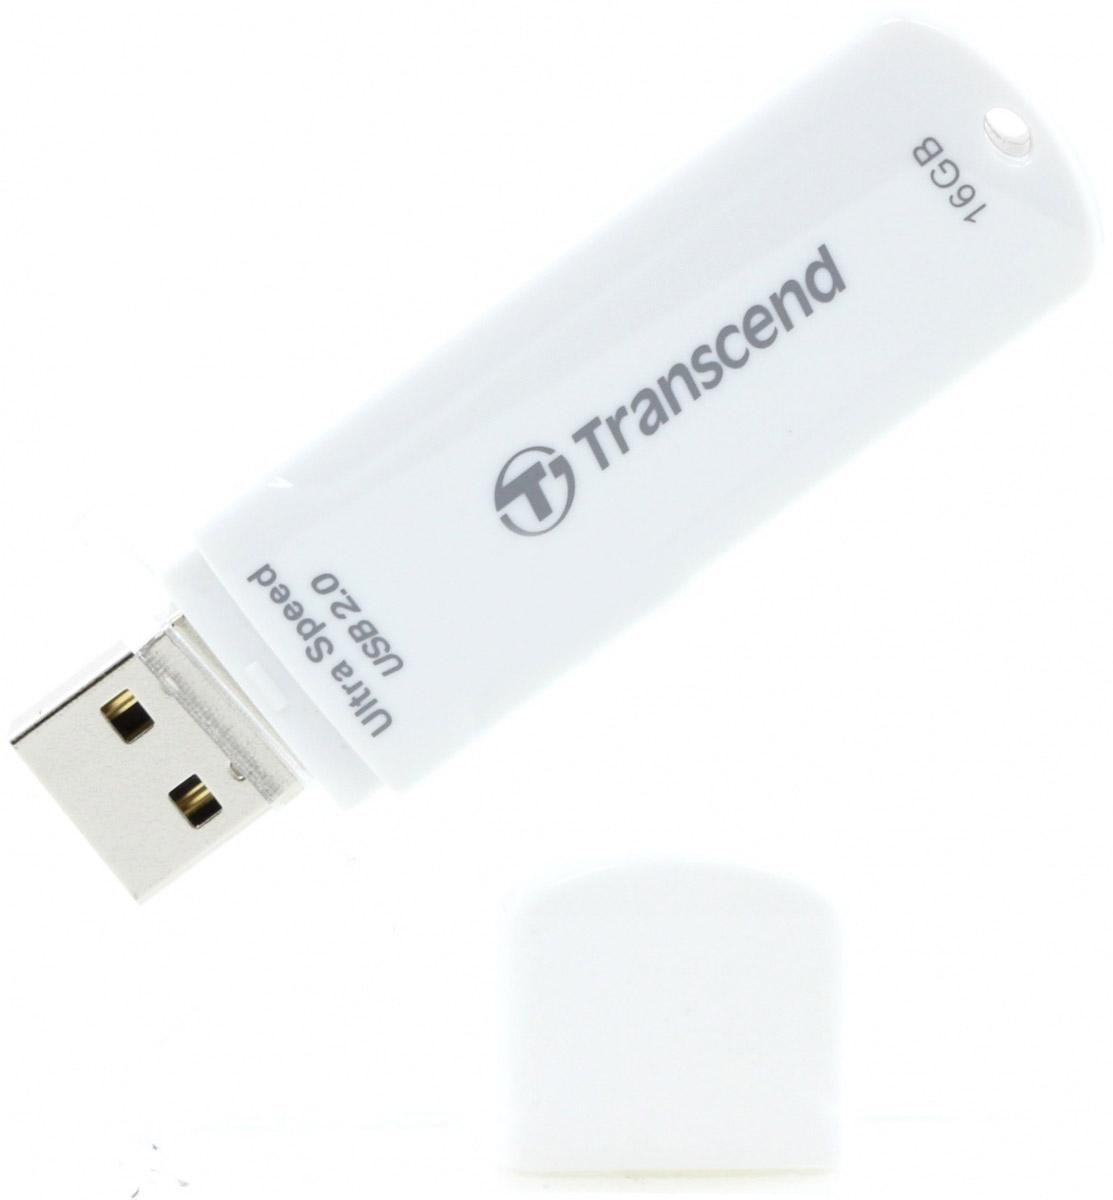 Transcend JetFlash 620, 16 GB - Носители информации